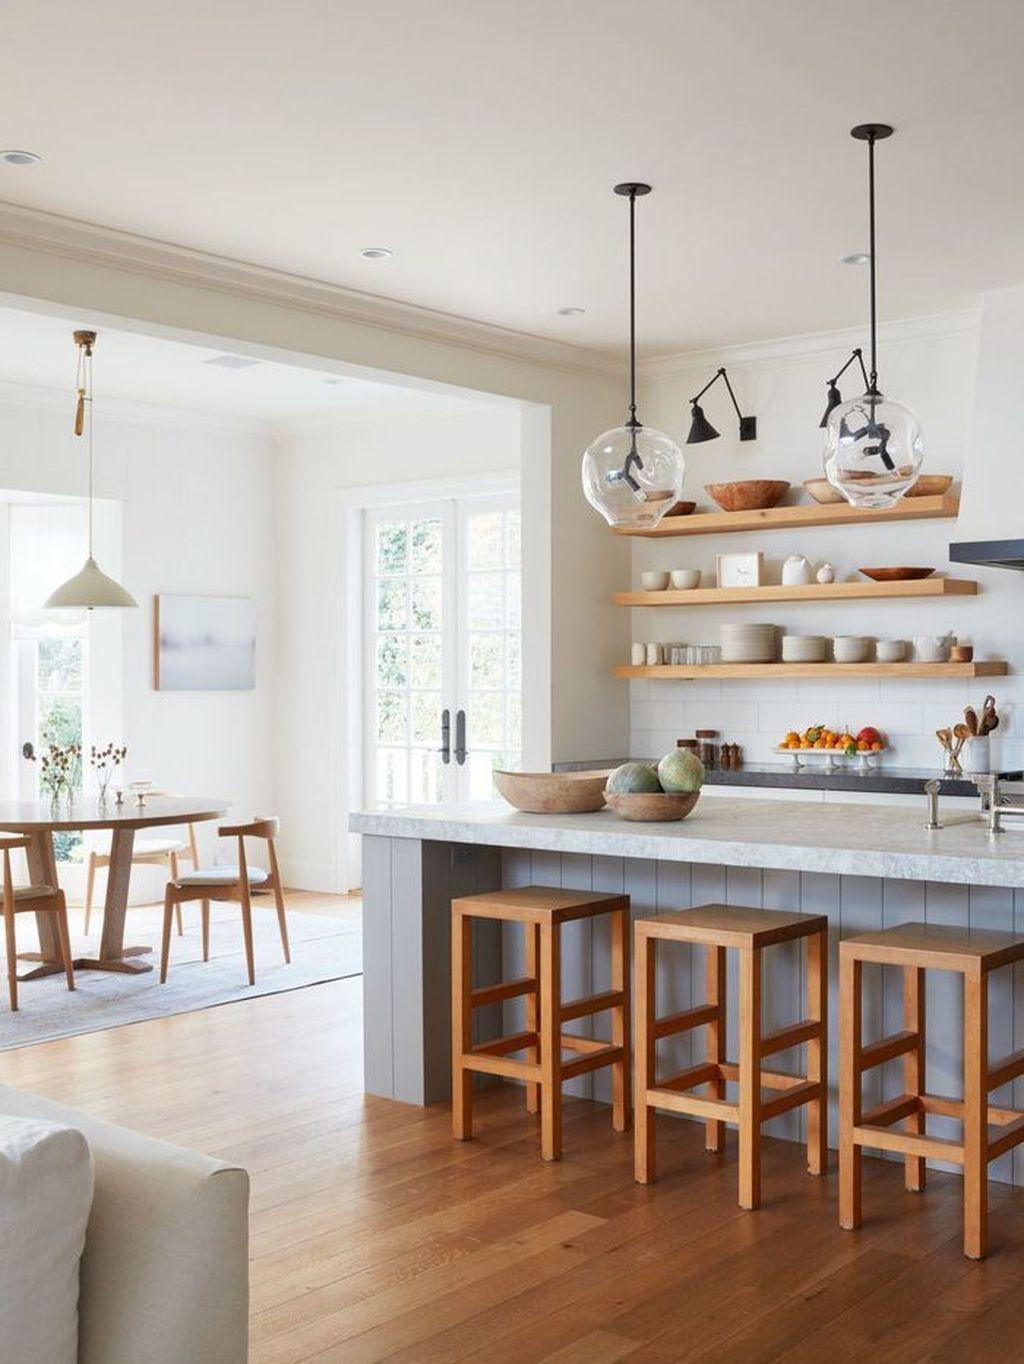 36 Inspiring Colonial Farmhouse Designs Ideas You Must Copy Now Interior Design Kitchen Home Decor Kitchen Kitchen Style